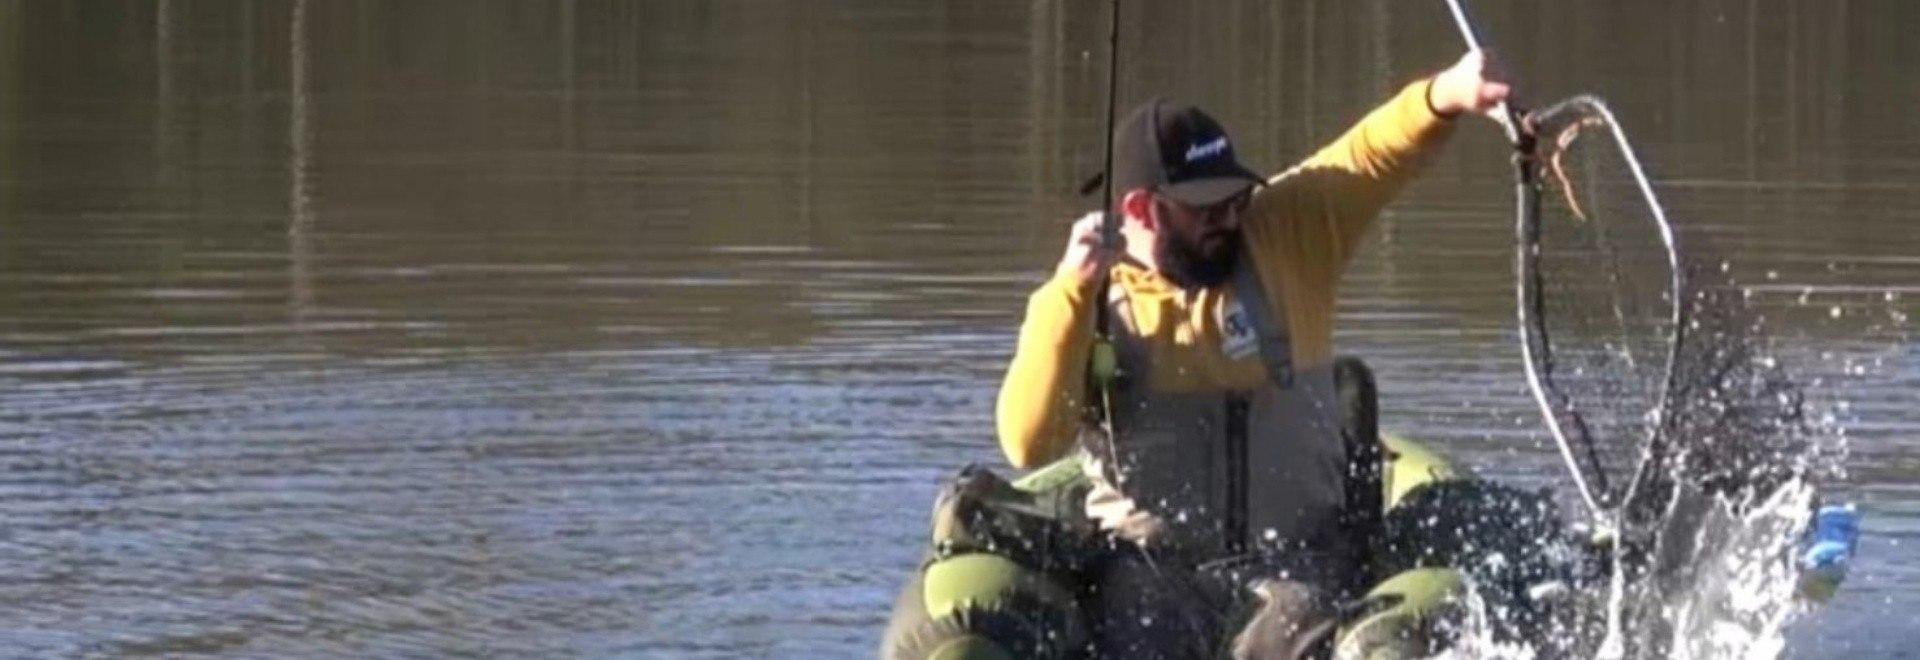 Storie di pescatori